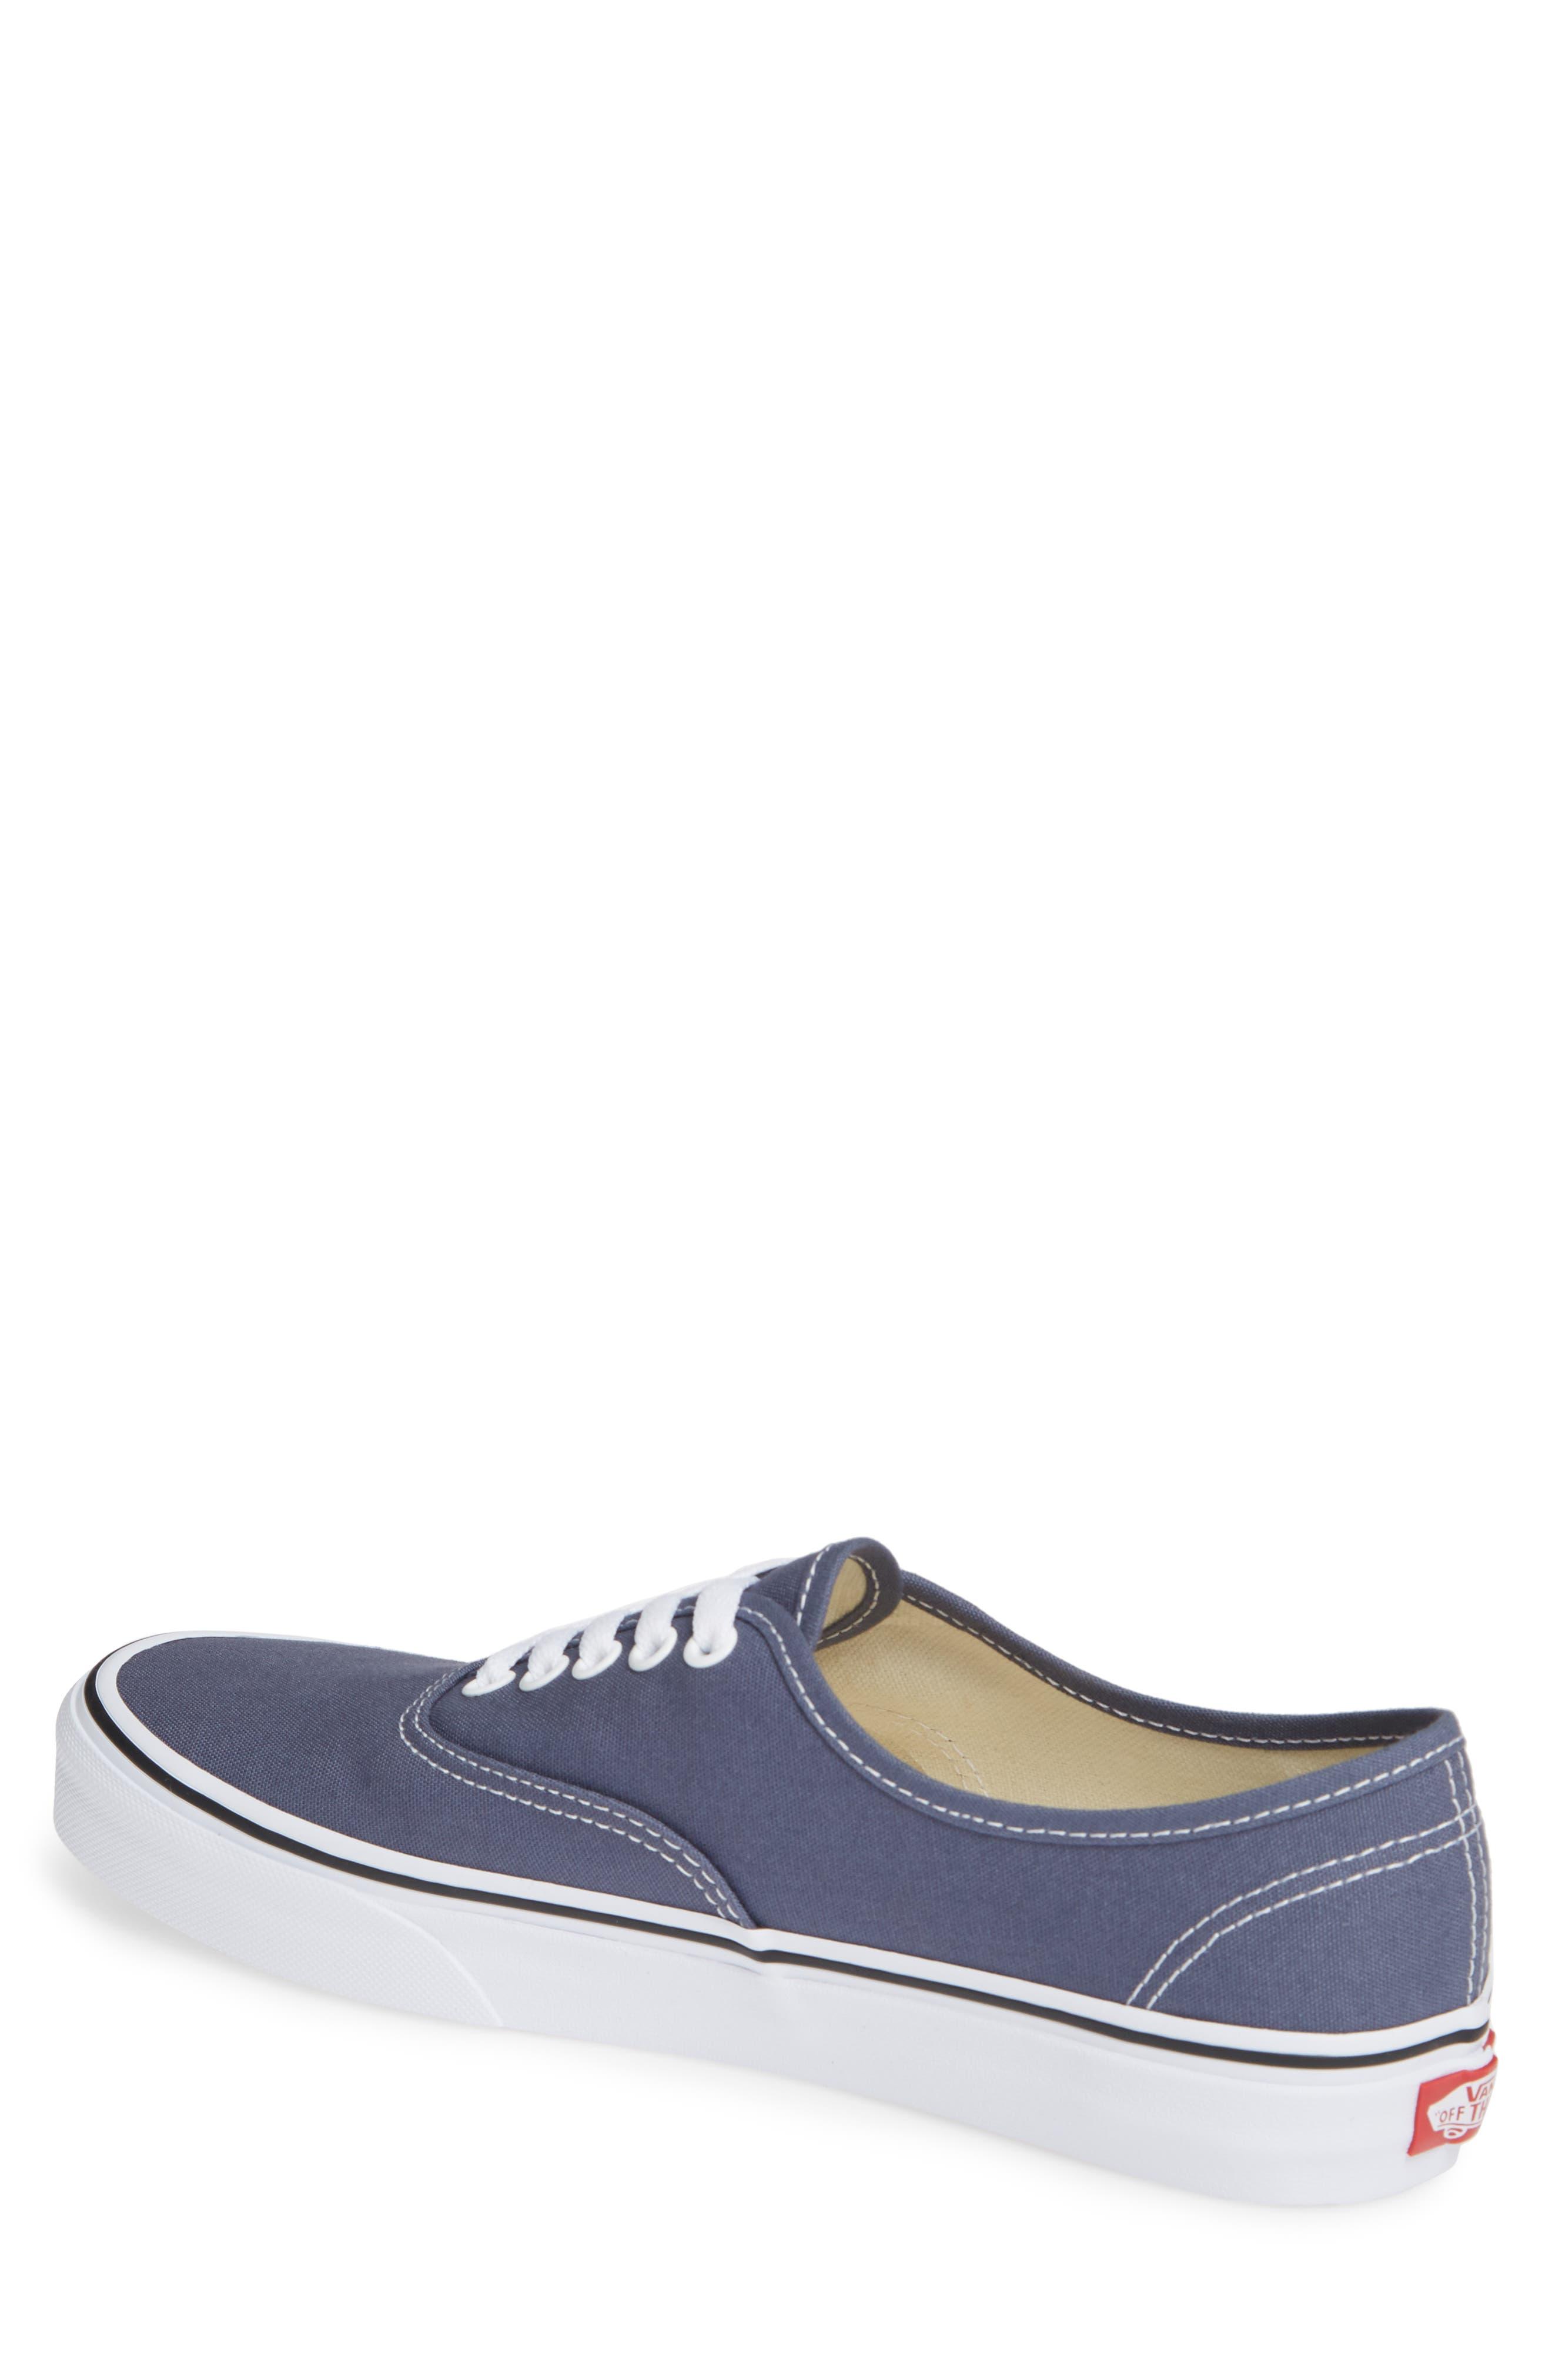 'Authentic' Sneaker,                             Alternate thumbnail 2, color,                             GREY/ TRUE WHITE